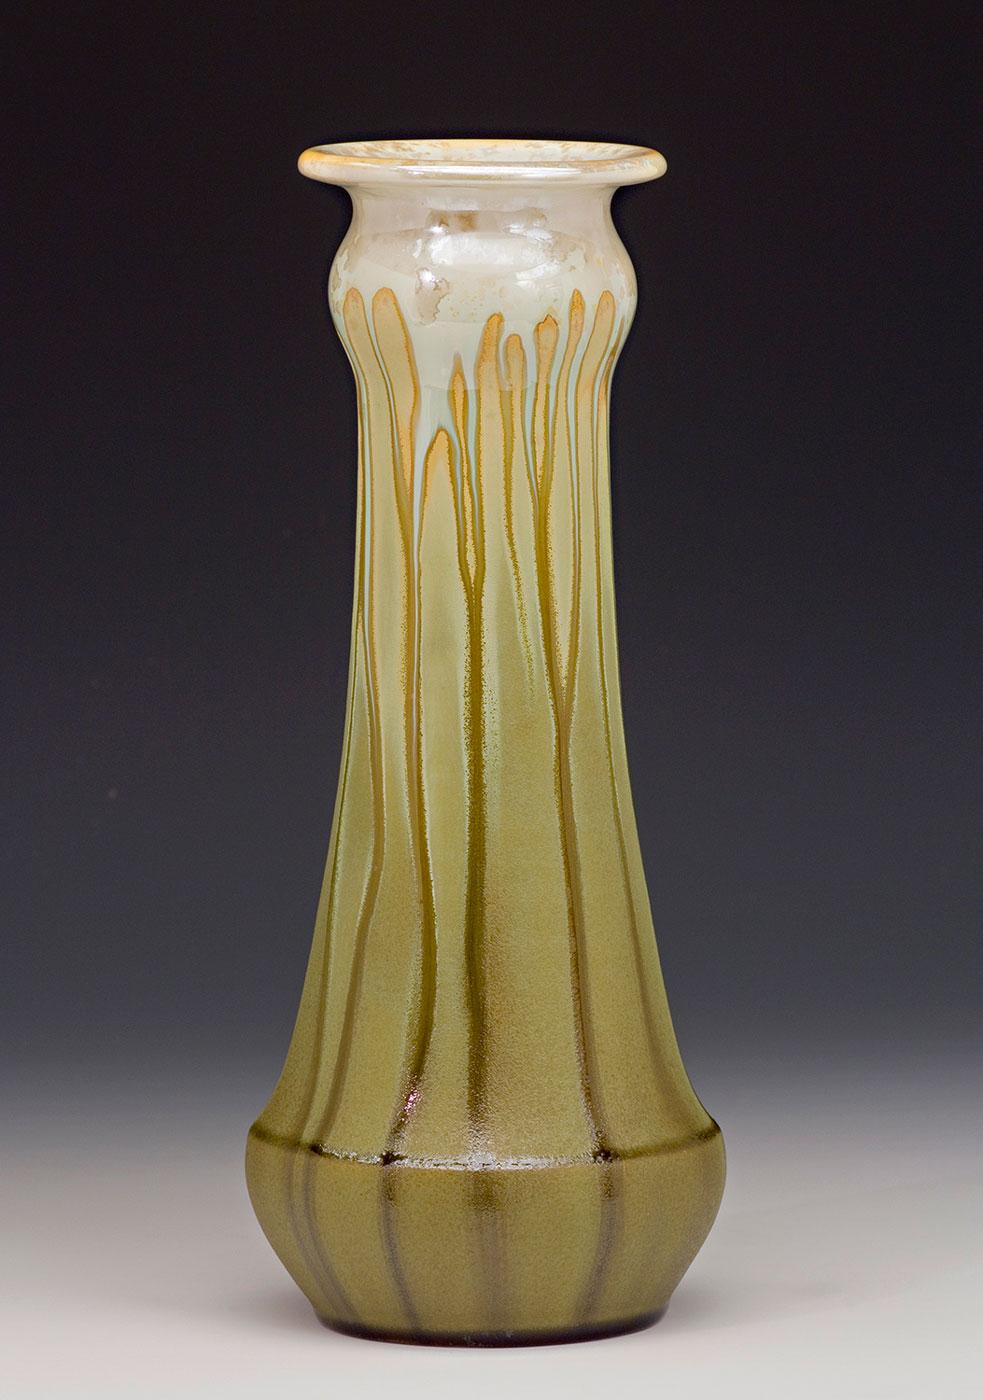 Art-Pottery-Vase-olive-frost-crystalline-Samantha-Henneke-North-Carolina.jpg